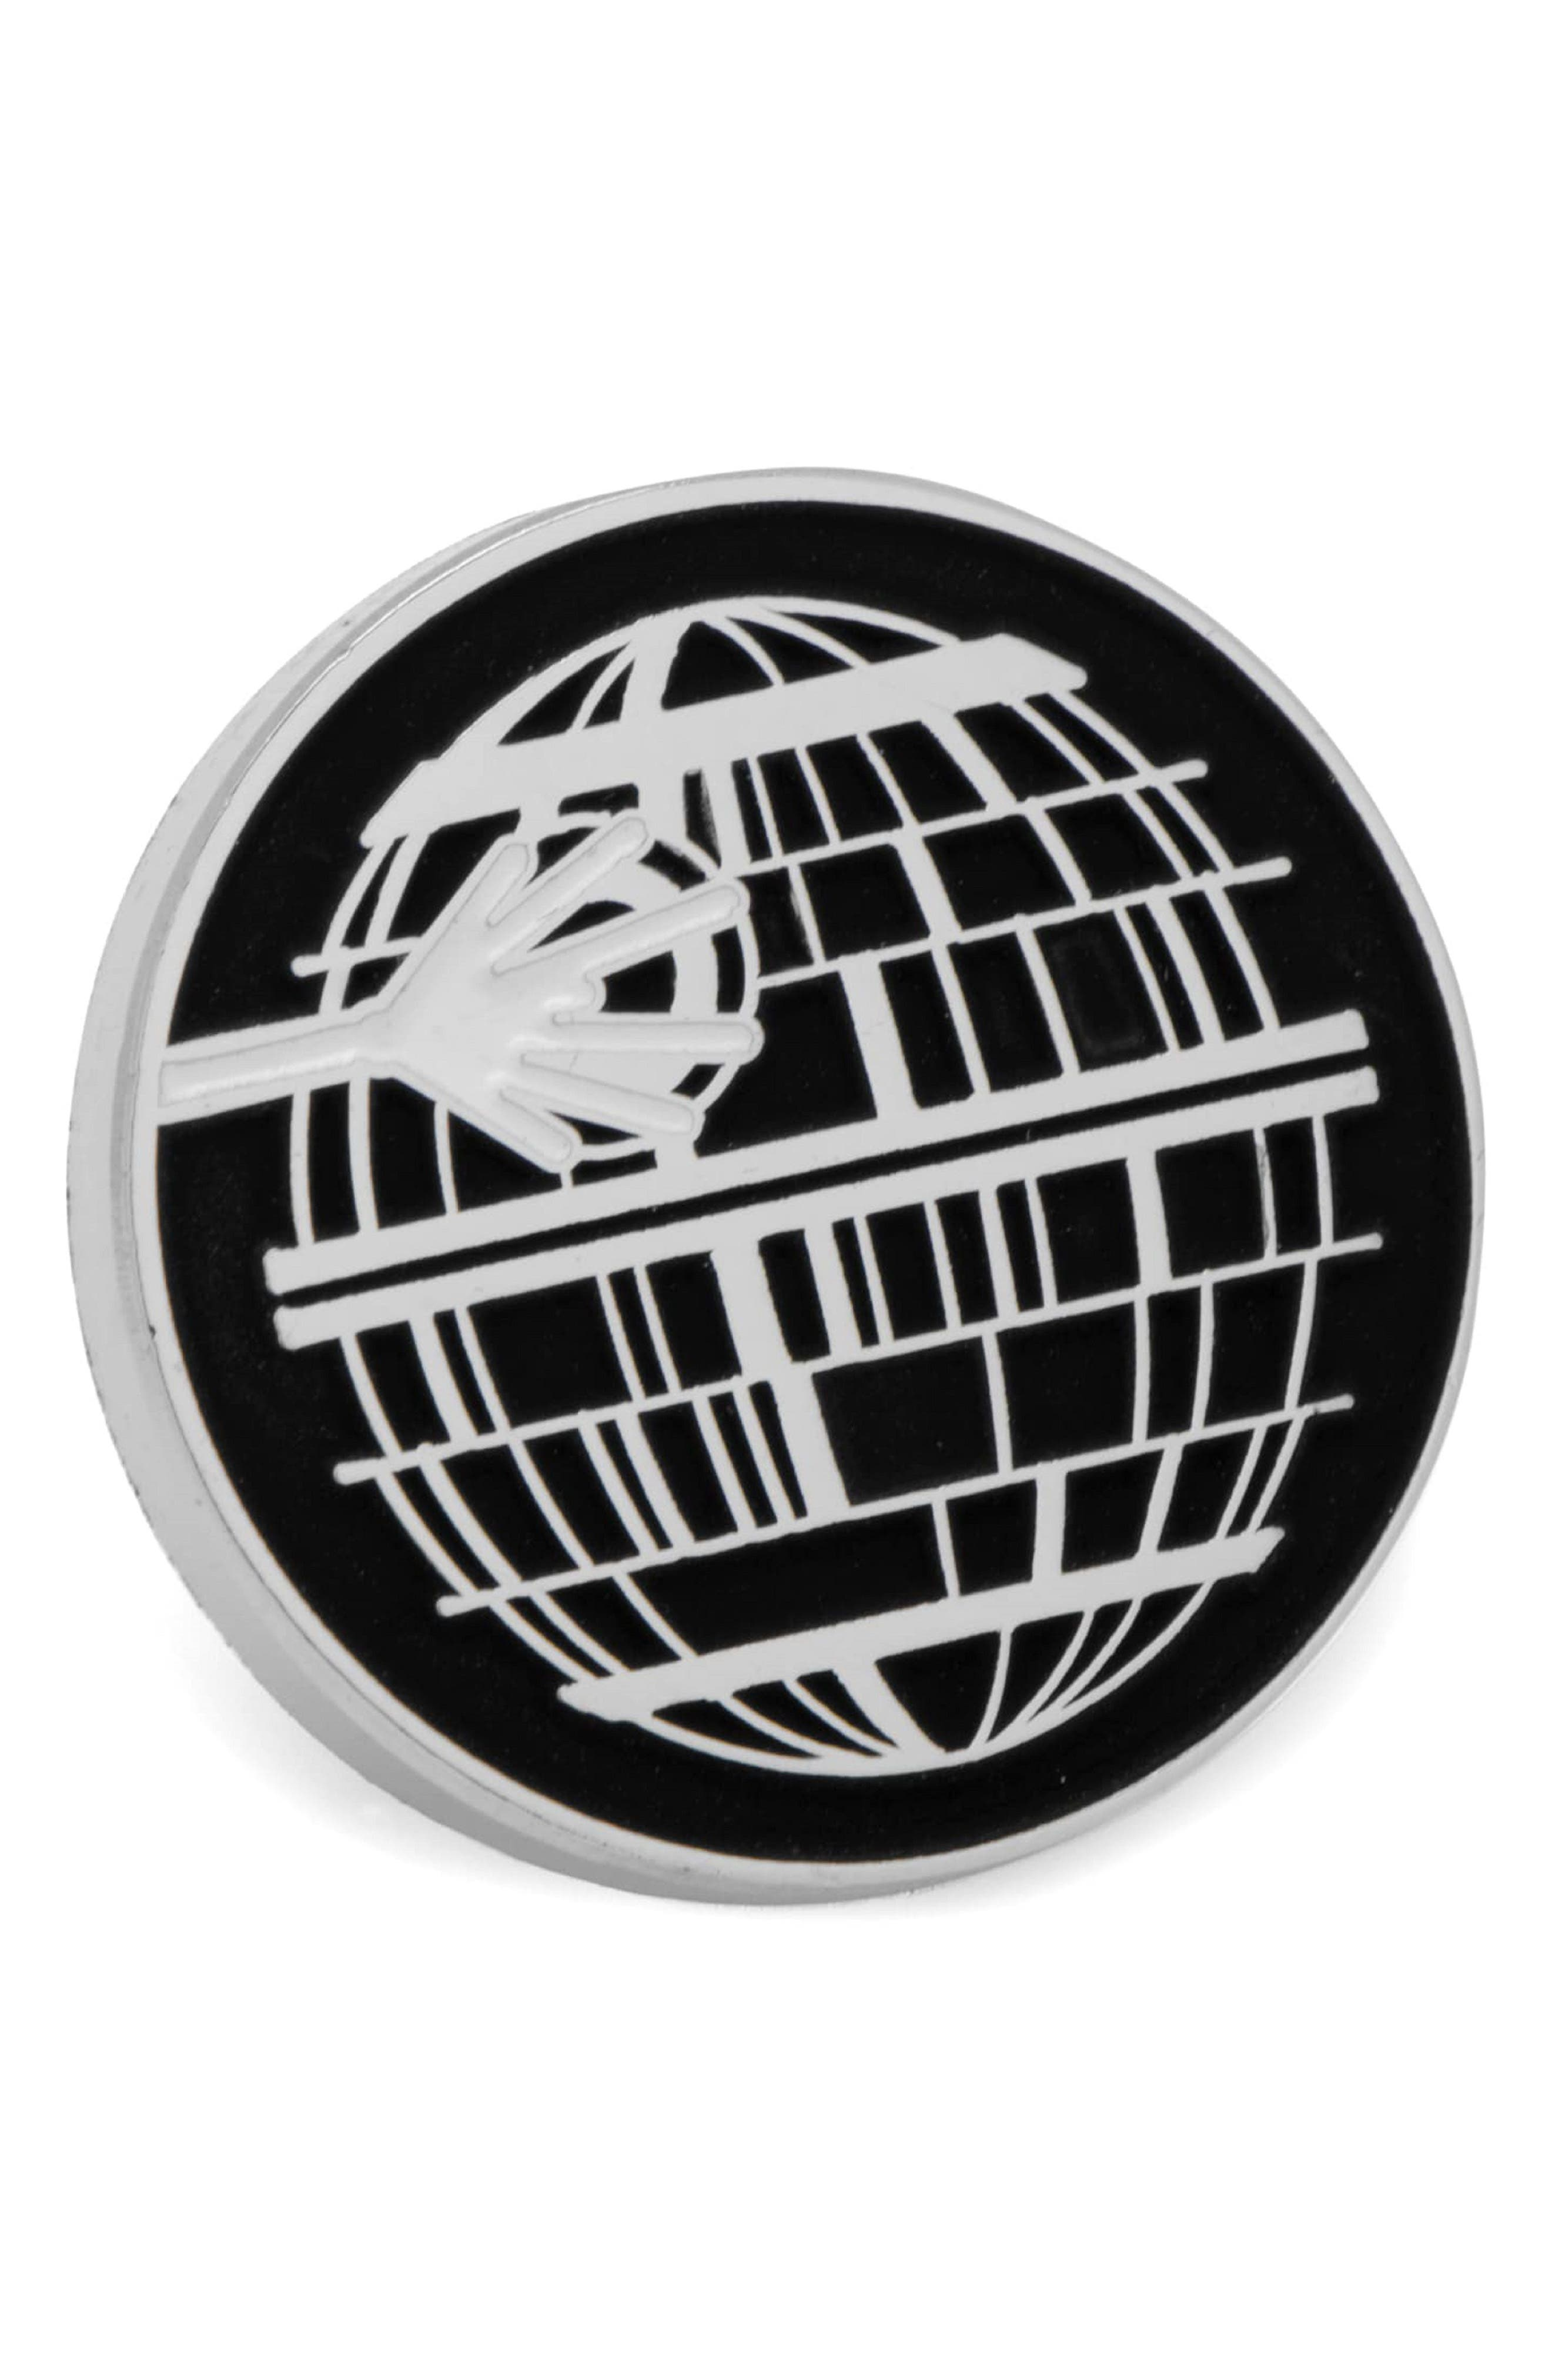 Star Wars<sup>™</sup> - Death Star Lapel Pin,                             Main thumbnail 1, color,                             Silver